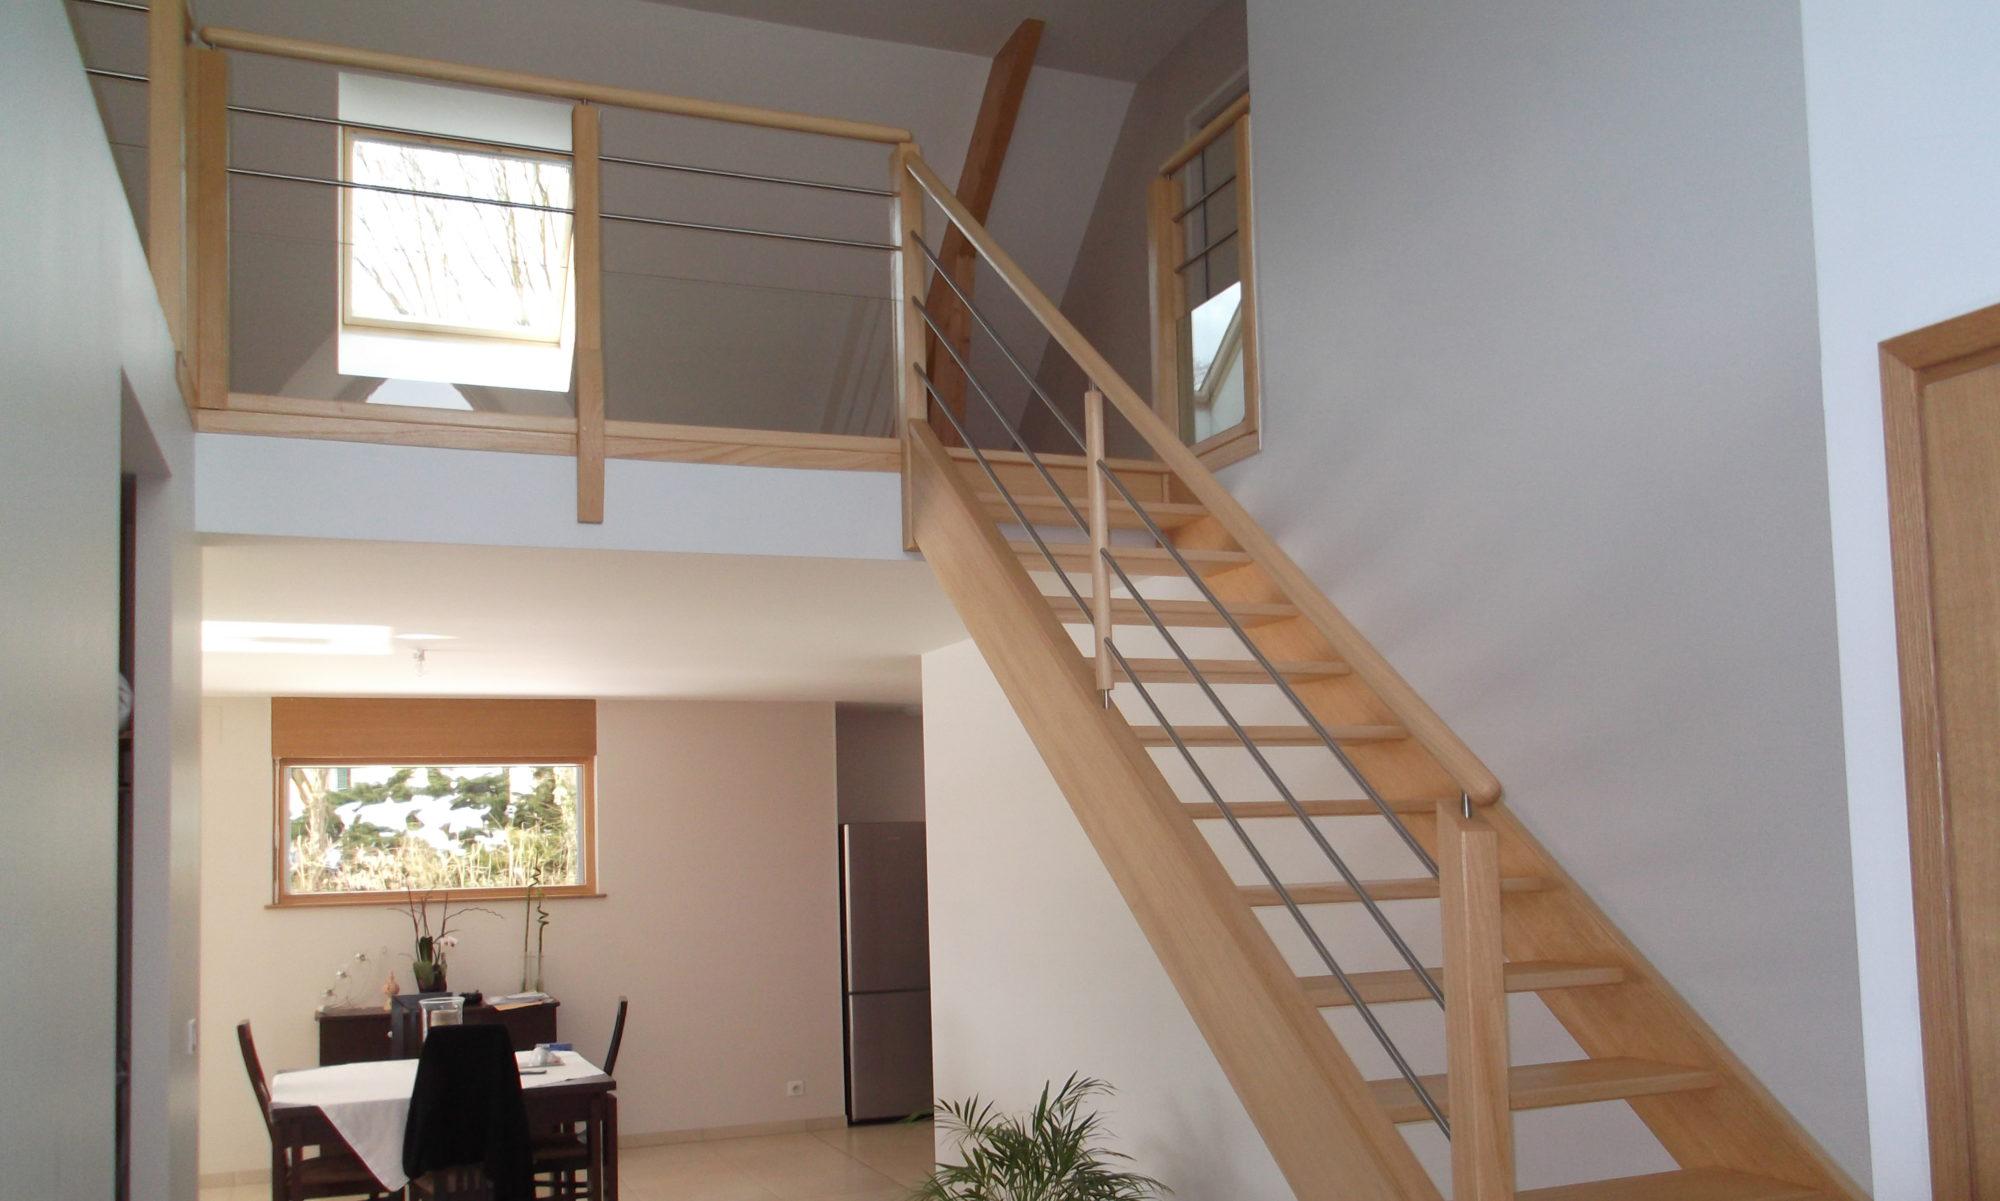 Fabricant d'escaliers sur-mesure - Debret Escaliers